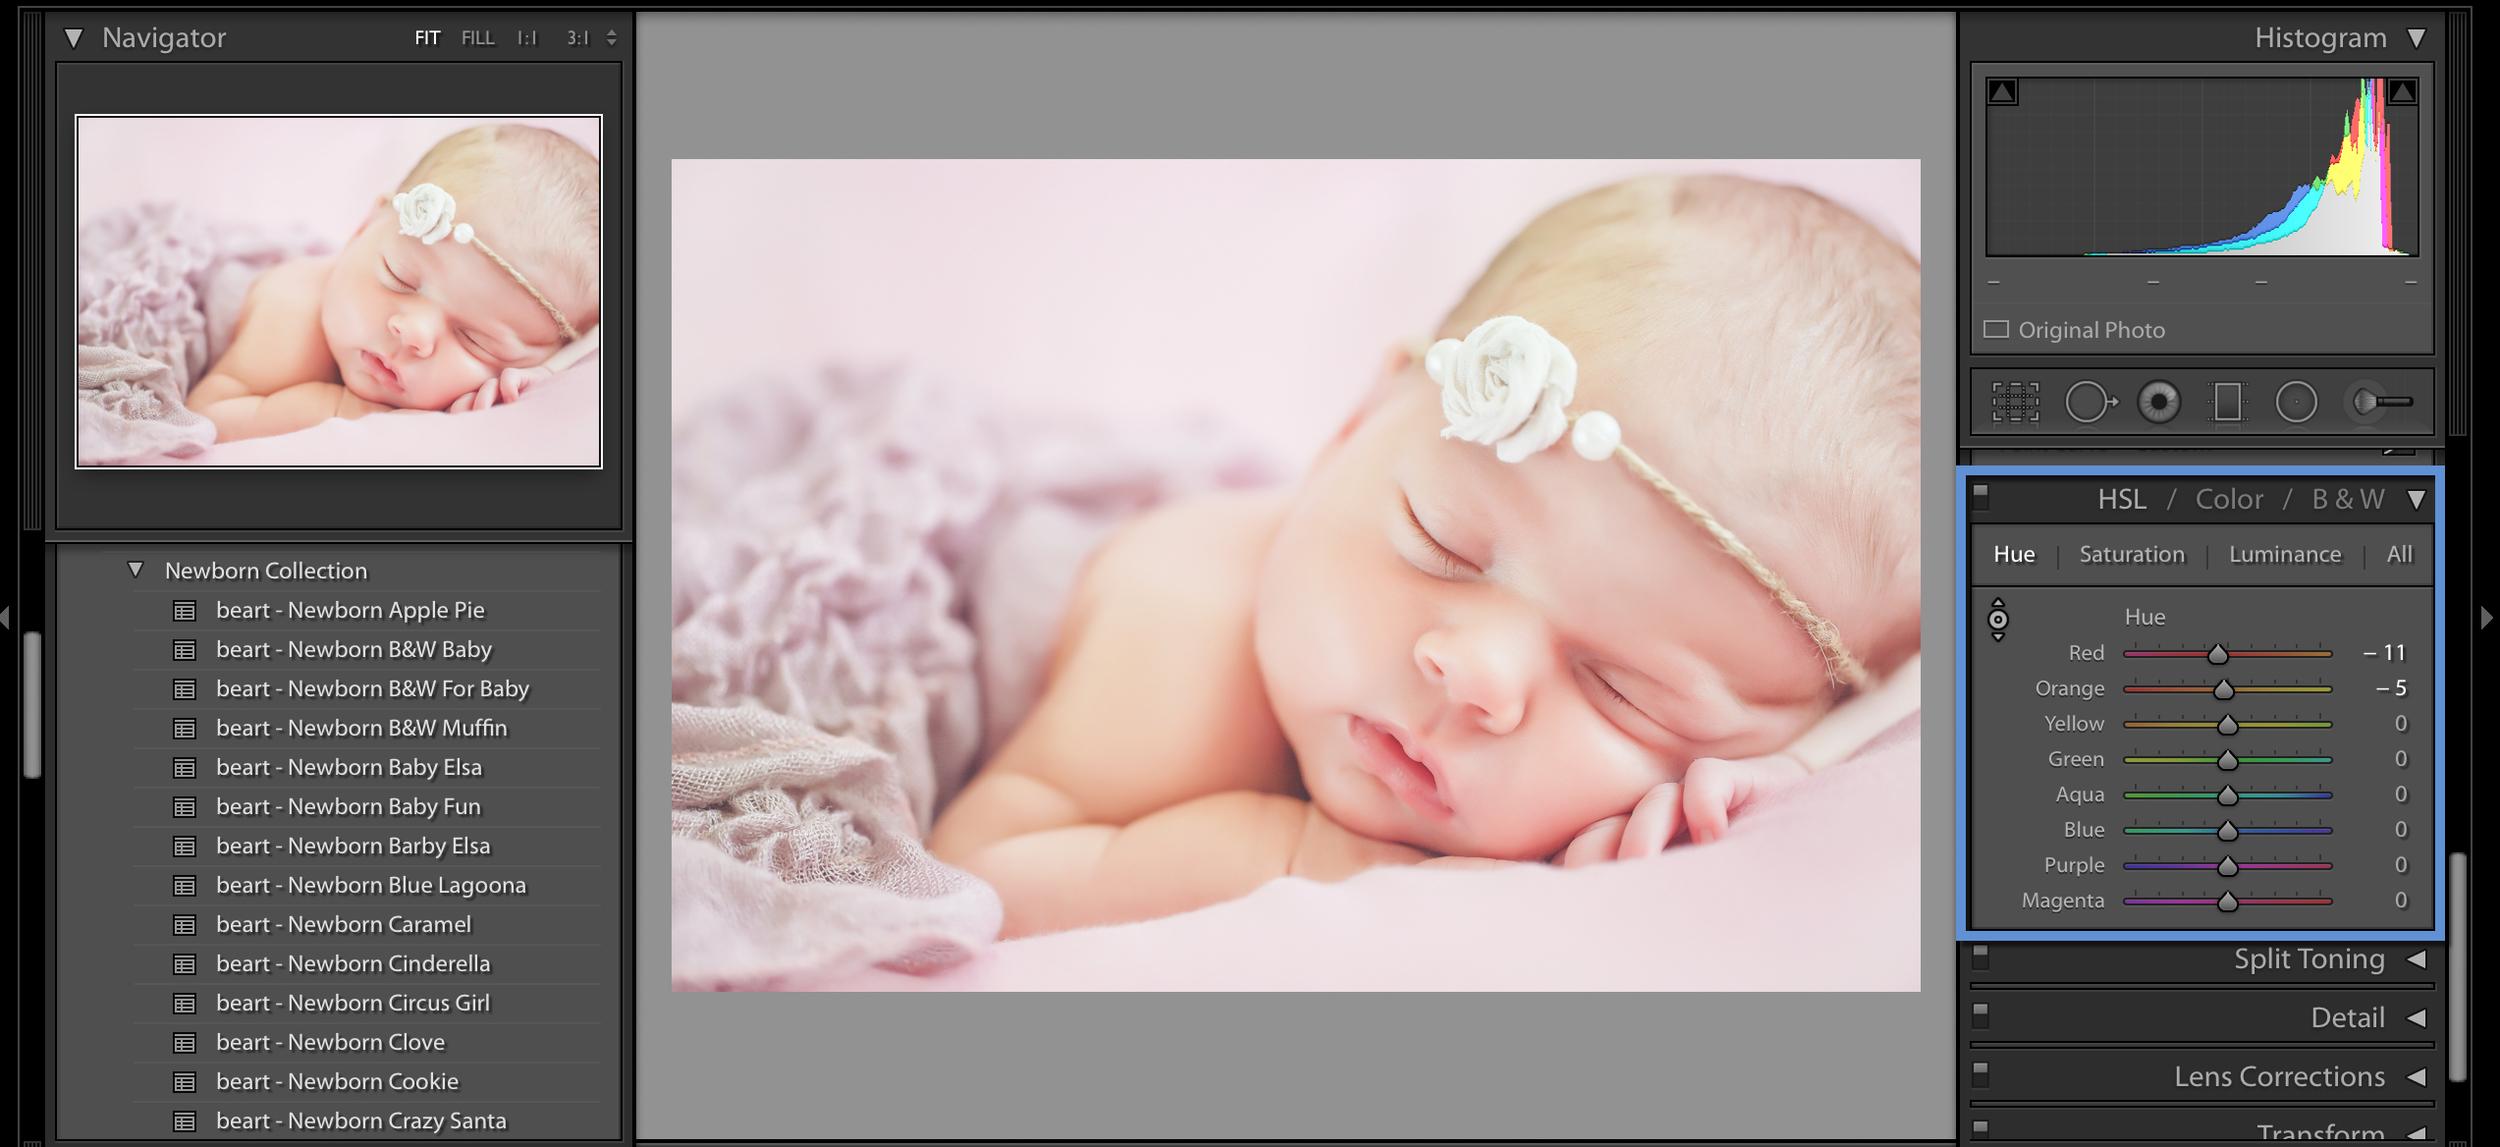 newborn images for photoshop an lightroom